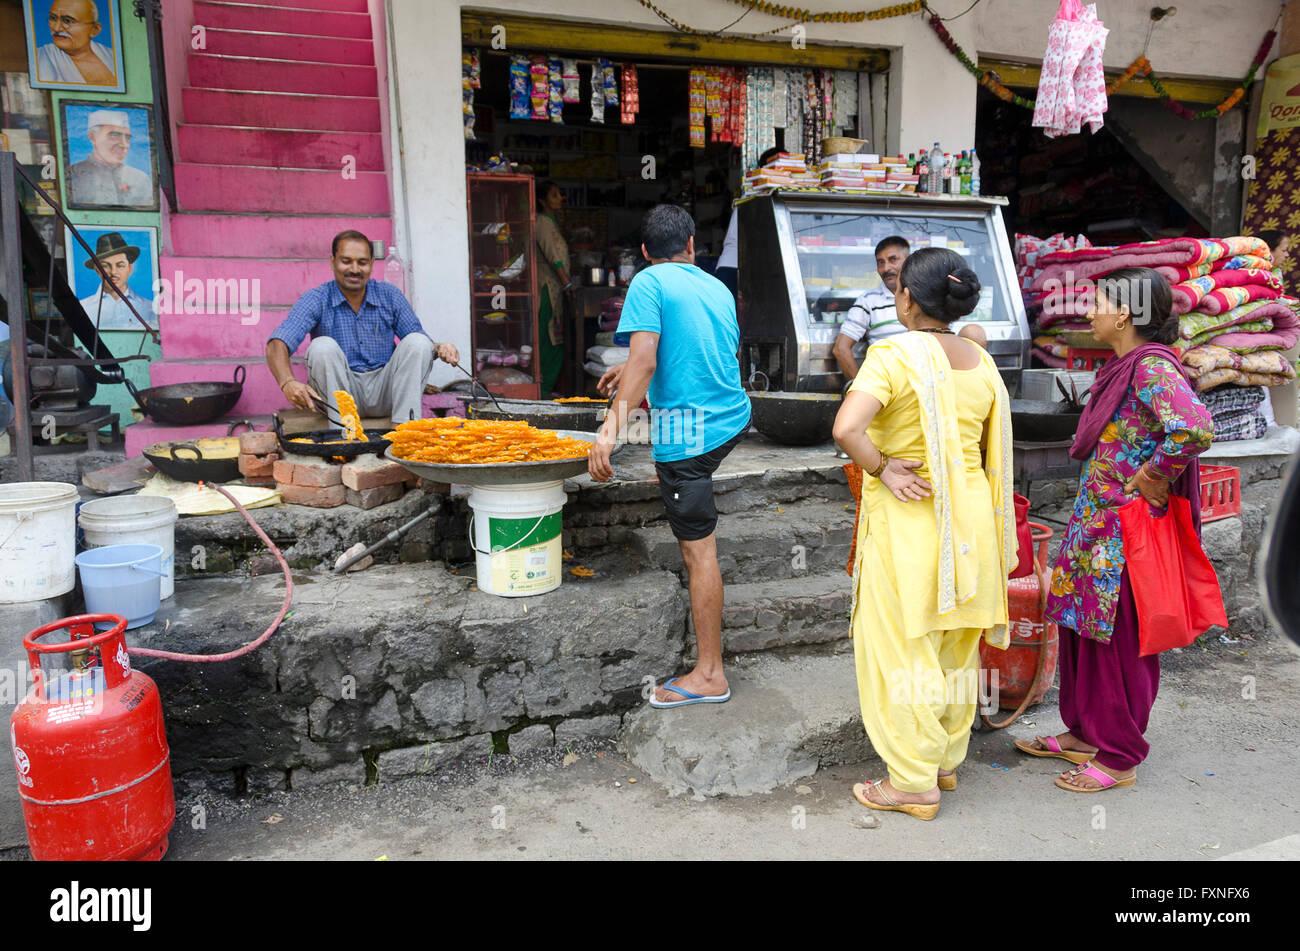 Roadside stall making jelabis, near Dharamsala, Kangra Distict, Himachal Pradesh, India, - Stock Image